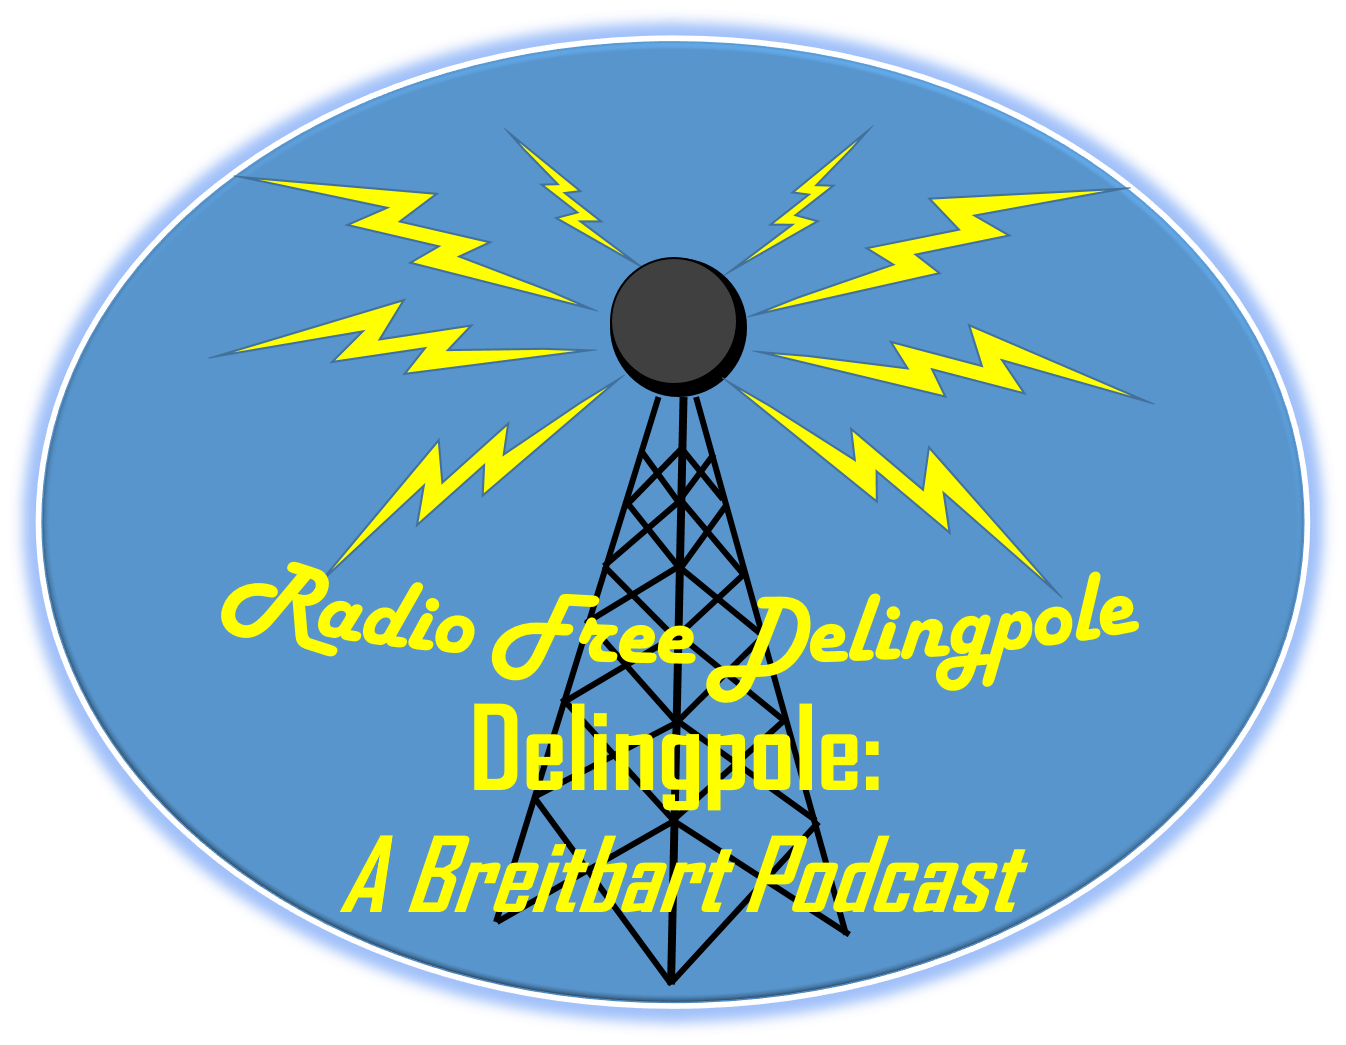 Radio Free Delingpole